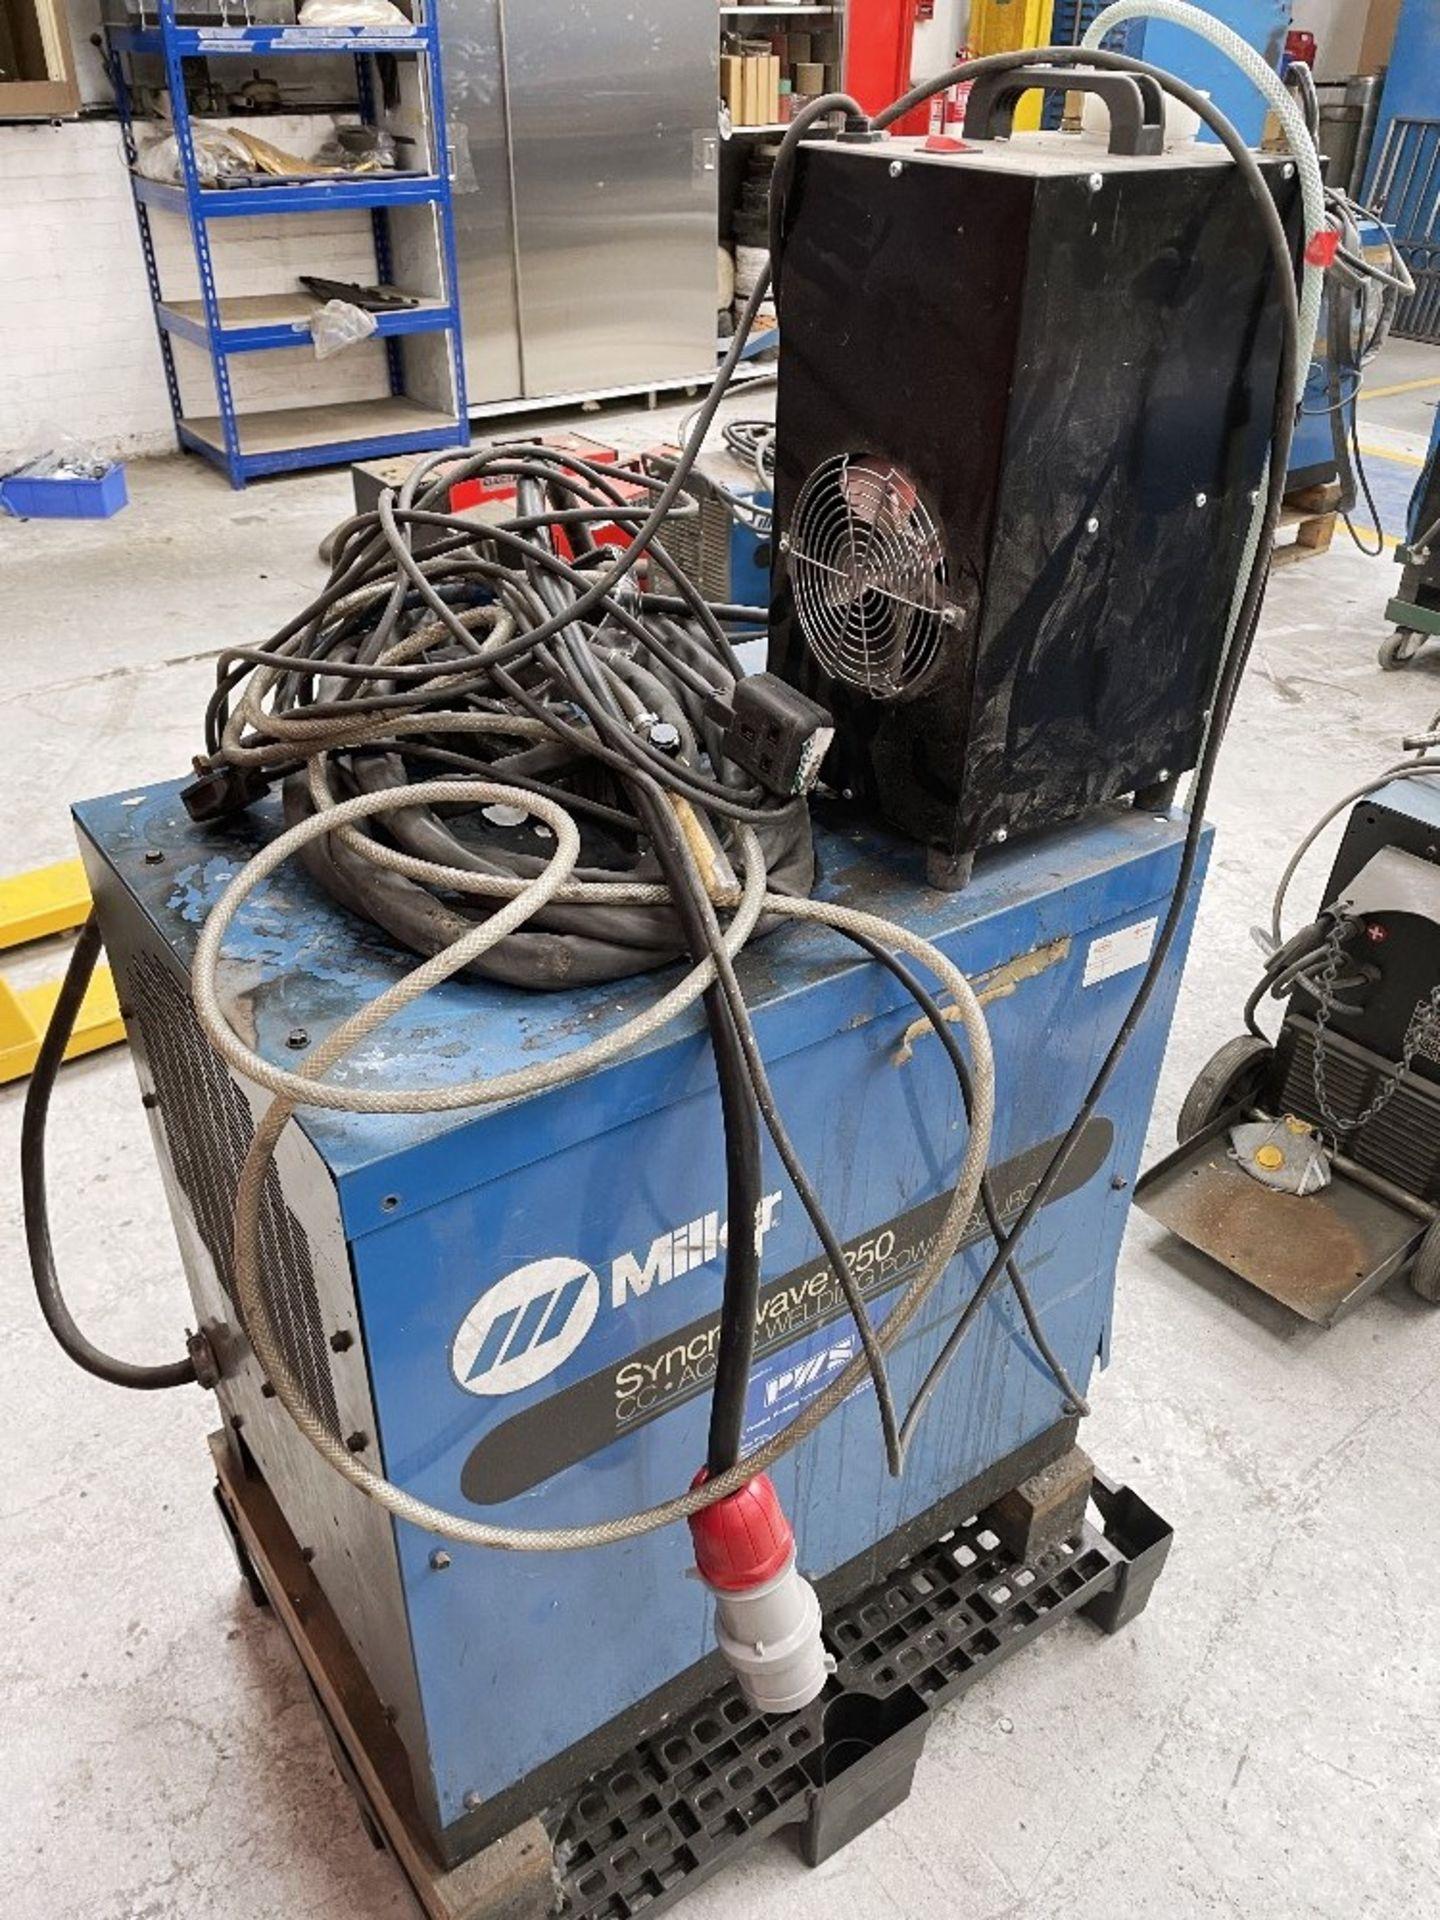 Miller Syncrowave 250 Tig Welder w/ TecArc XC1000 Water Cooler - Image 5 of 5